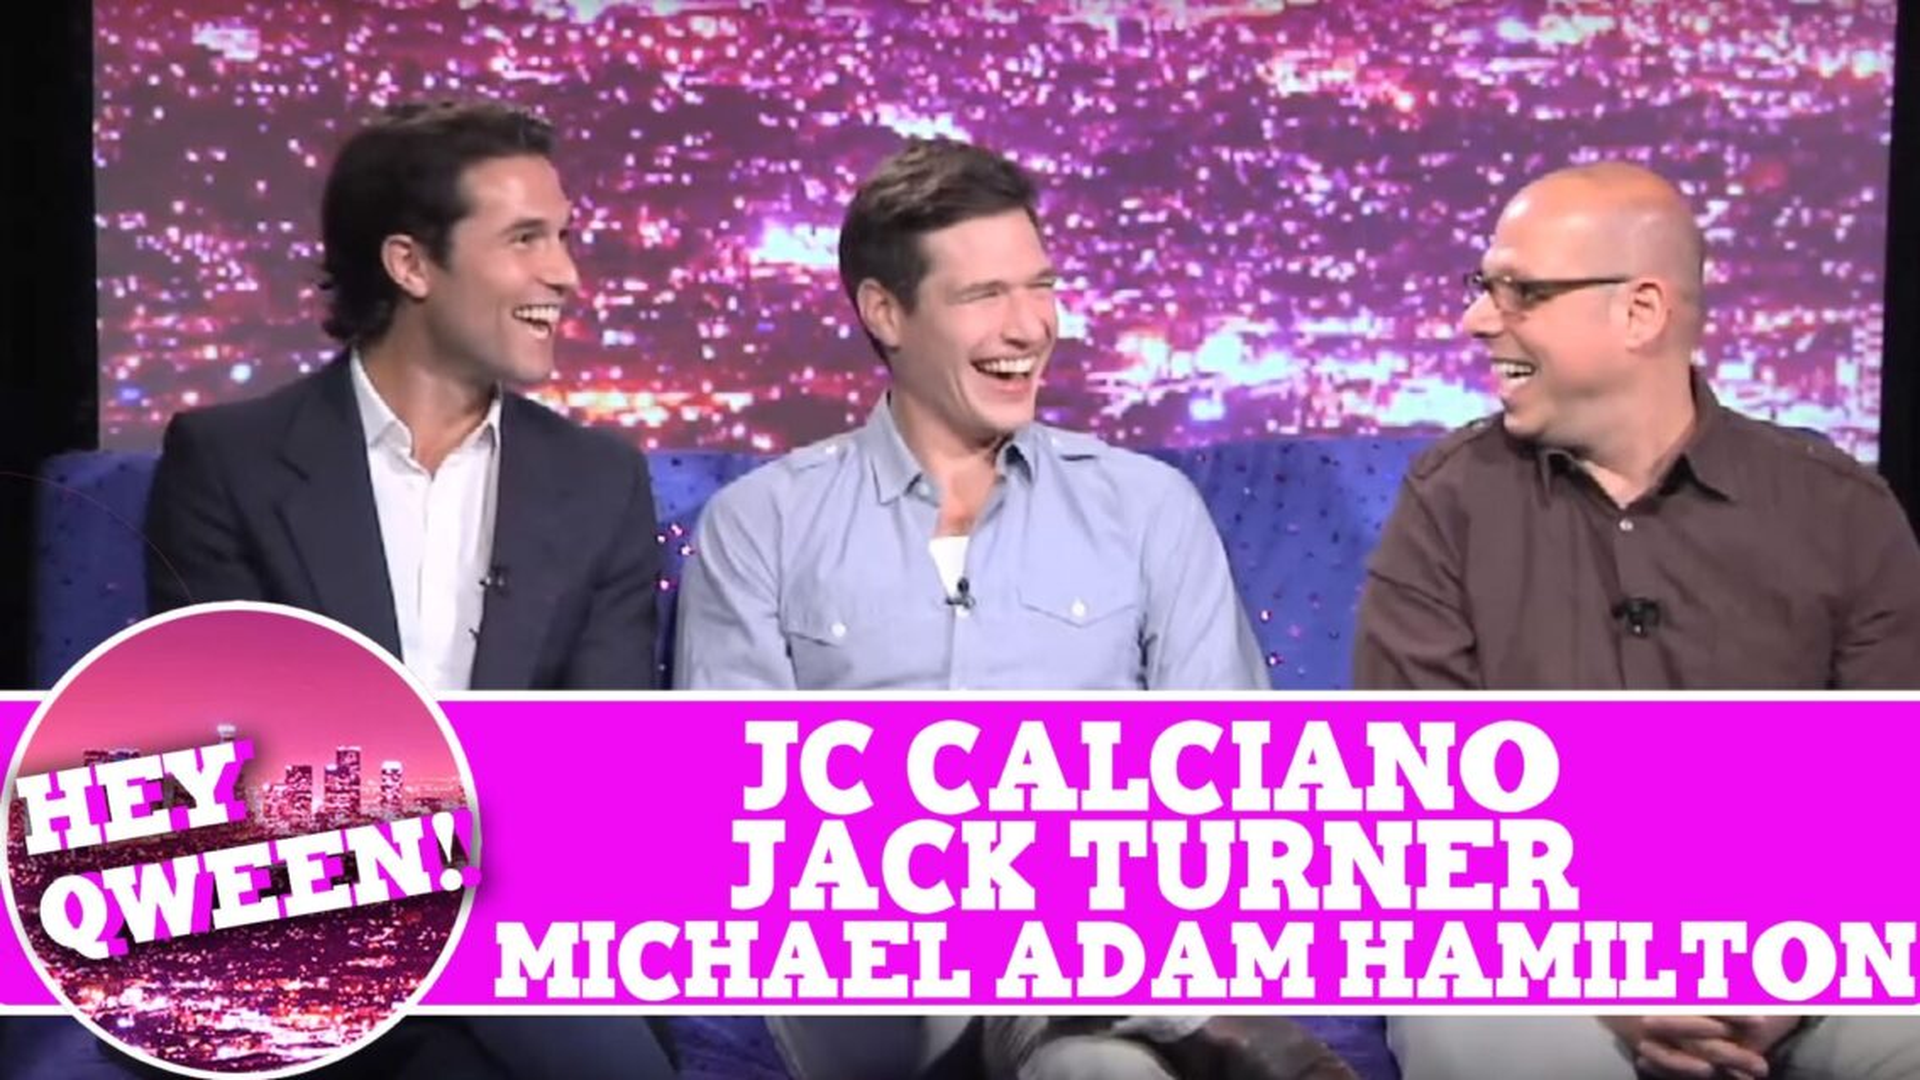 JC Calciano, Jack Turner & Michael Adam Hamilton on Hey Qween With Jonny McGovern